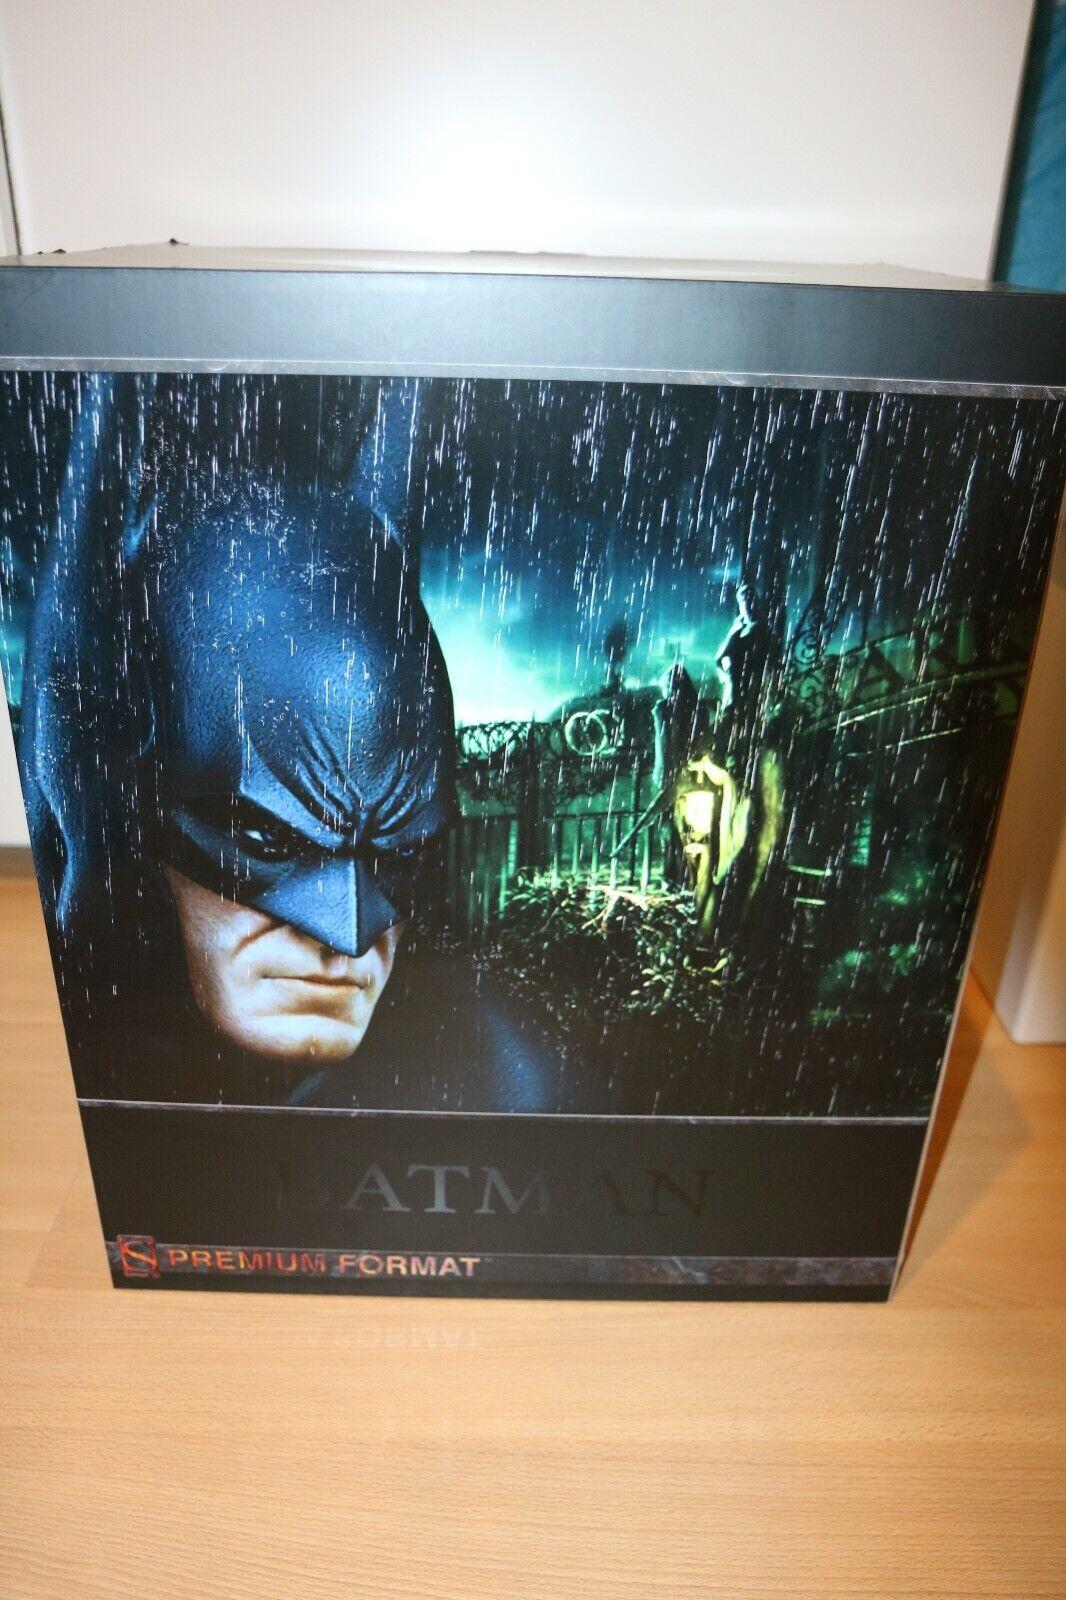 Sidemostrare Batuomo Arkham asylum Premium Format cifra DC Regular edizione 1081500